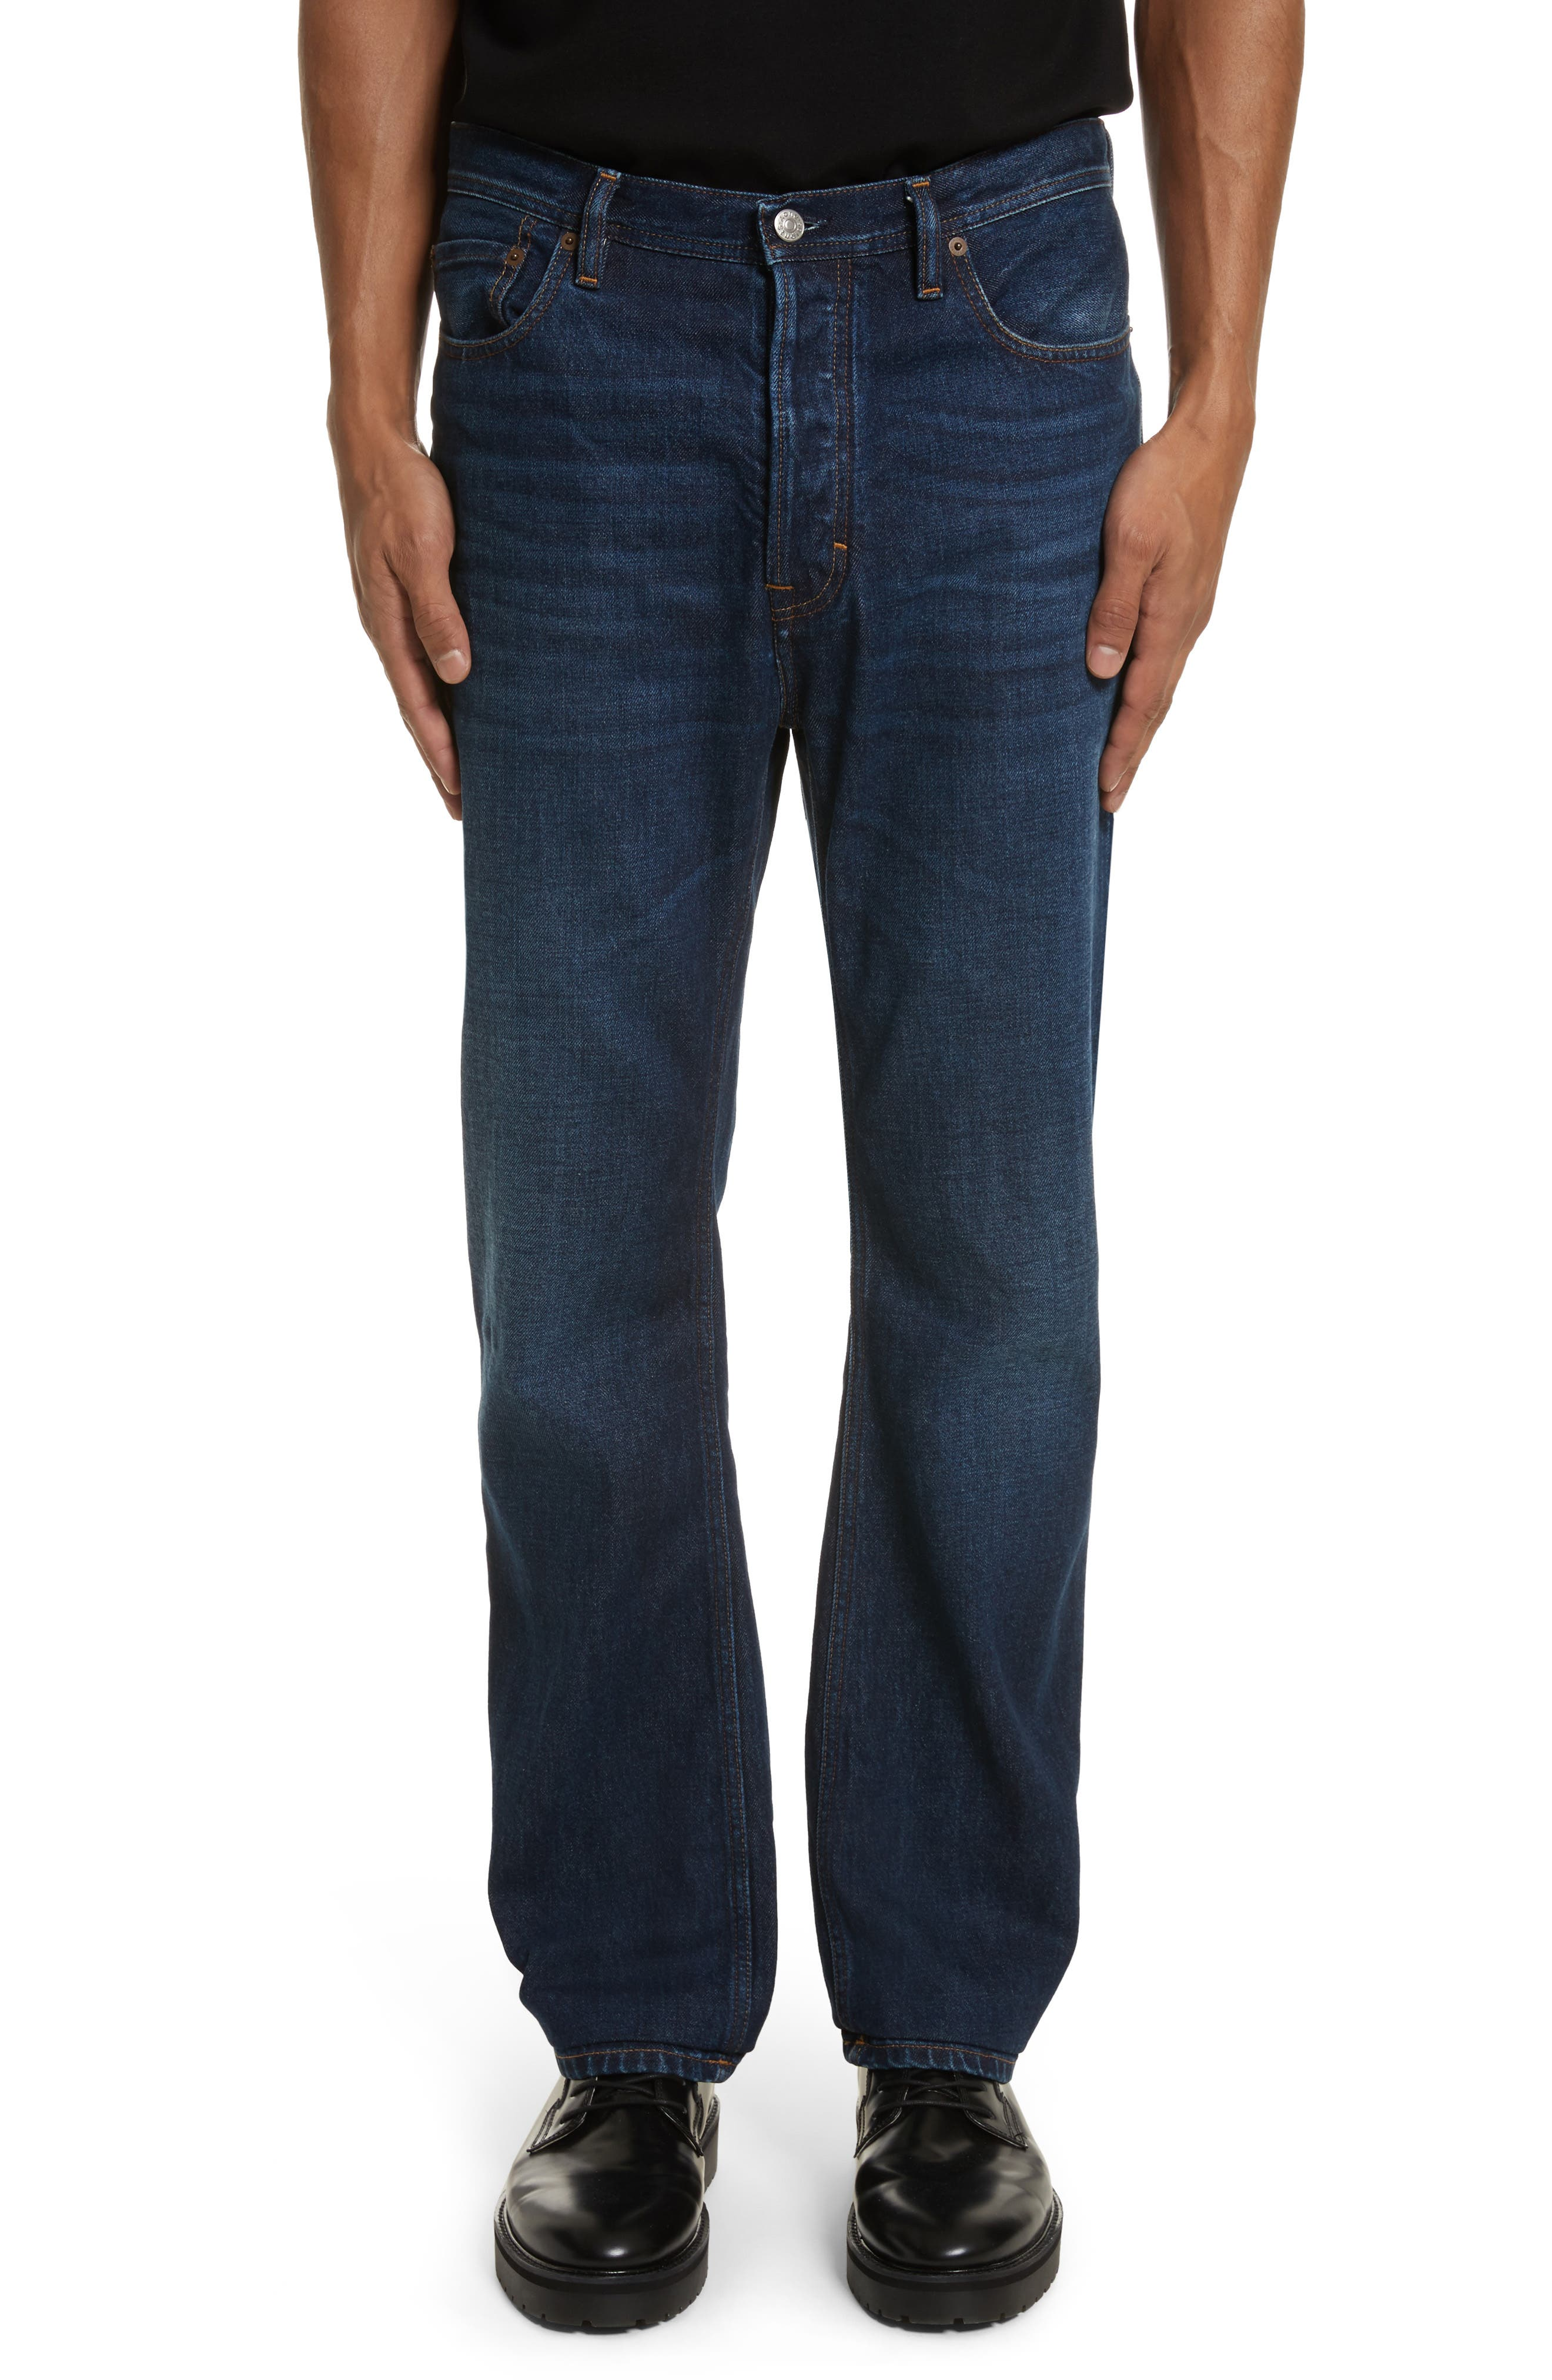 Land Classic Straight Leg Jeans,                             Main thumbnail 1, color,                             123 DK BLUE